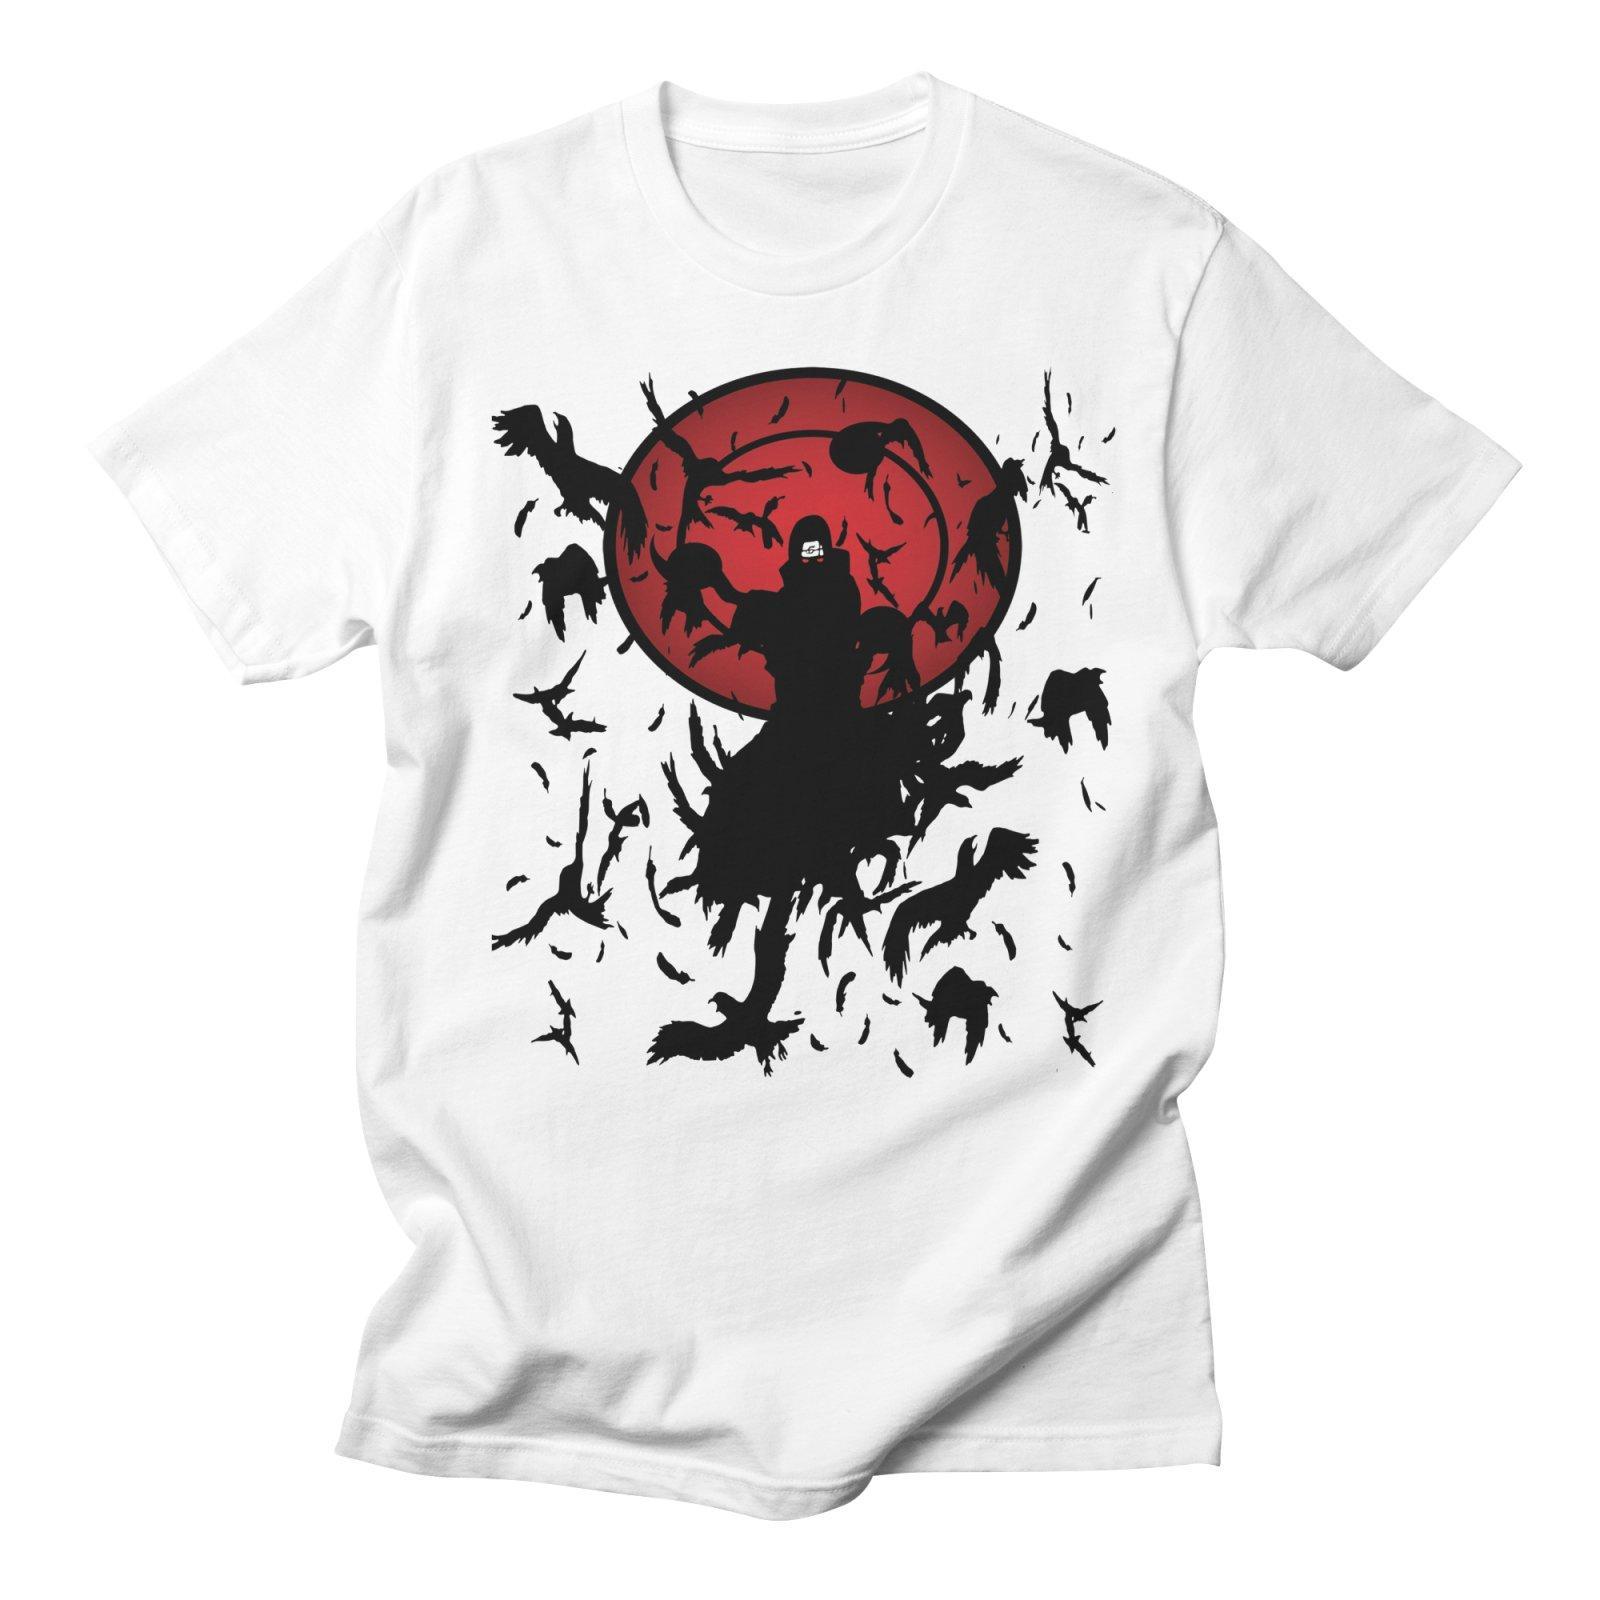 Compre Naruto Uchiha Itachi Anime Camisetas Moda Hombre Streetwear Harajuku  Algodón Casual Creativo Talla Grande Camiseta Blanca Para Hombres Ropa A   24.2 ... 2f0f39def00